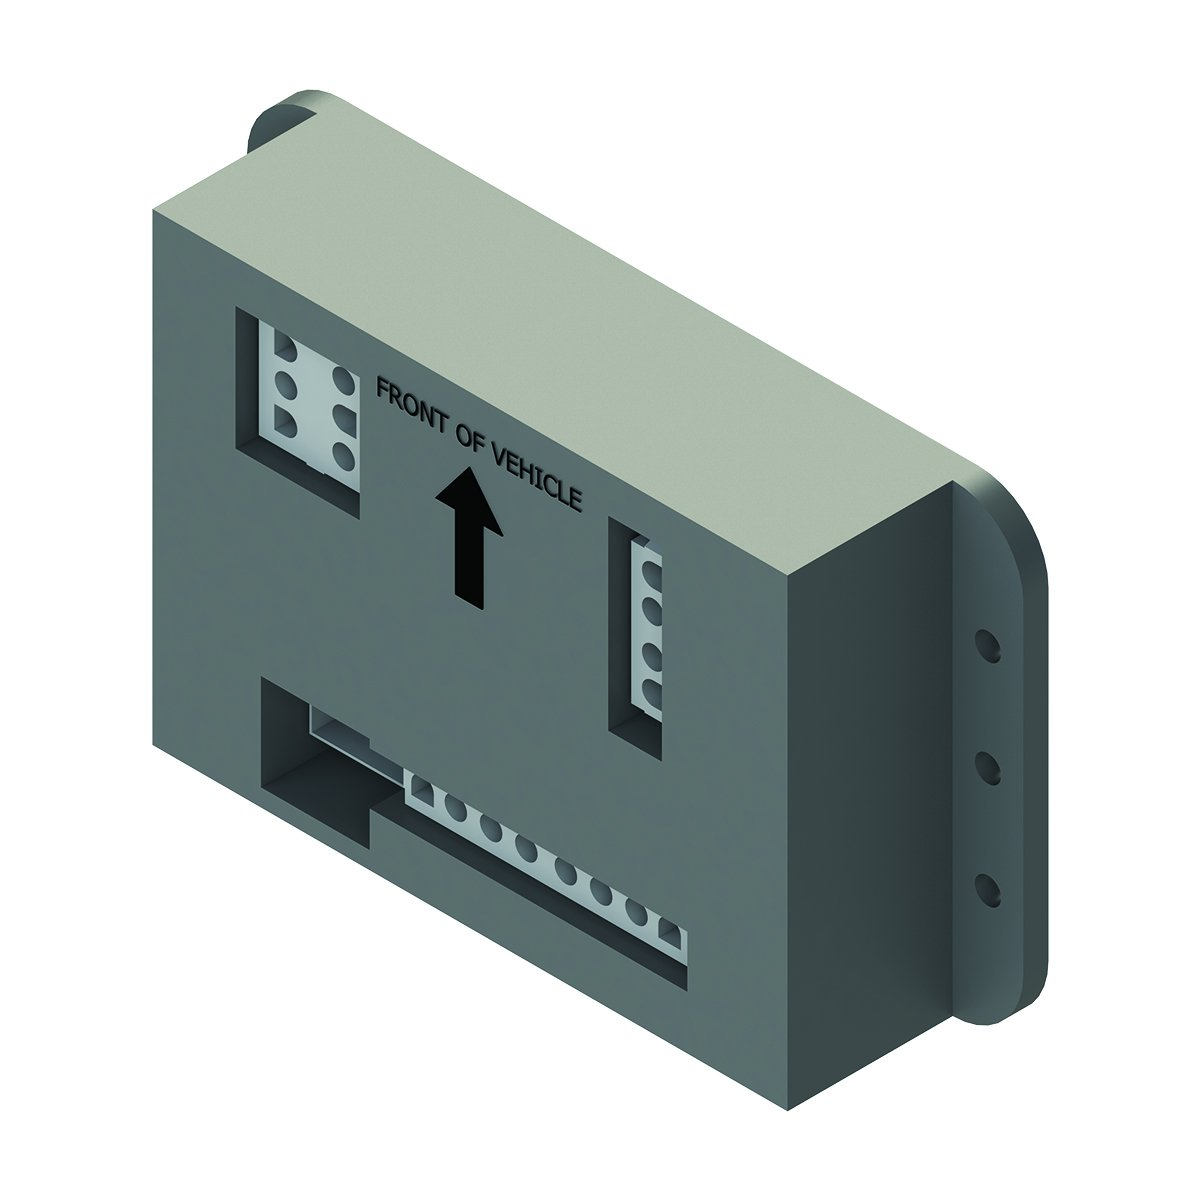 Power Gear 140-1229 Auto Level Control Box by Power Gear